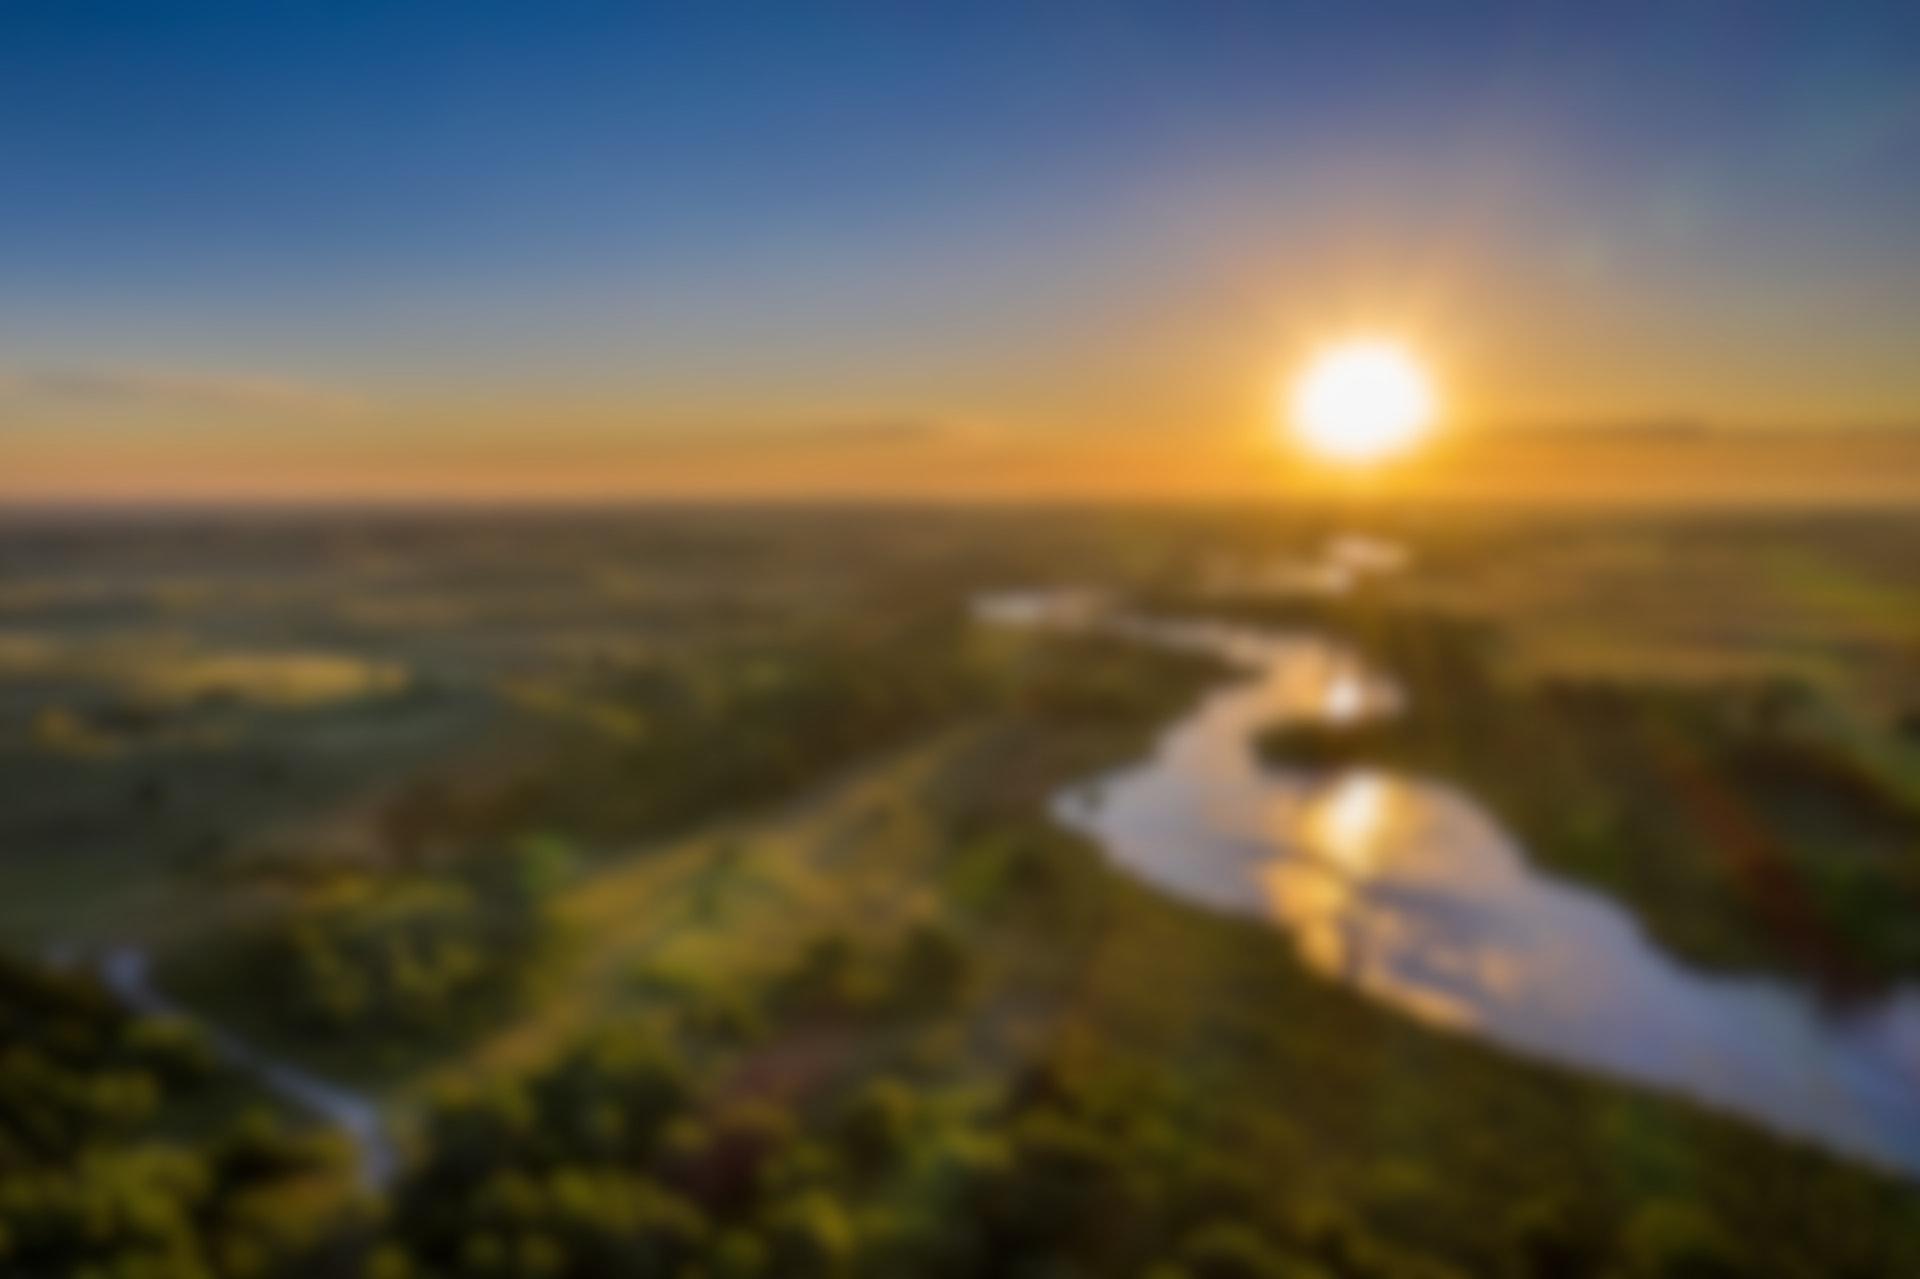 Aerial shot of rural nebraska